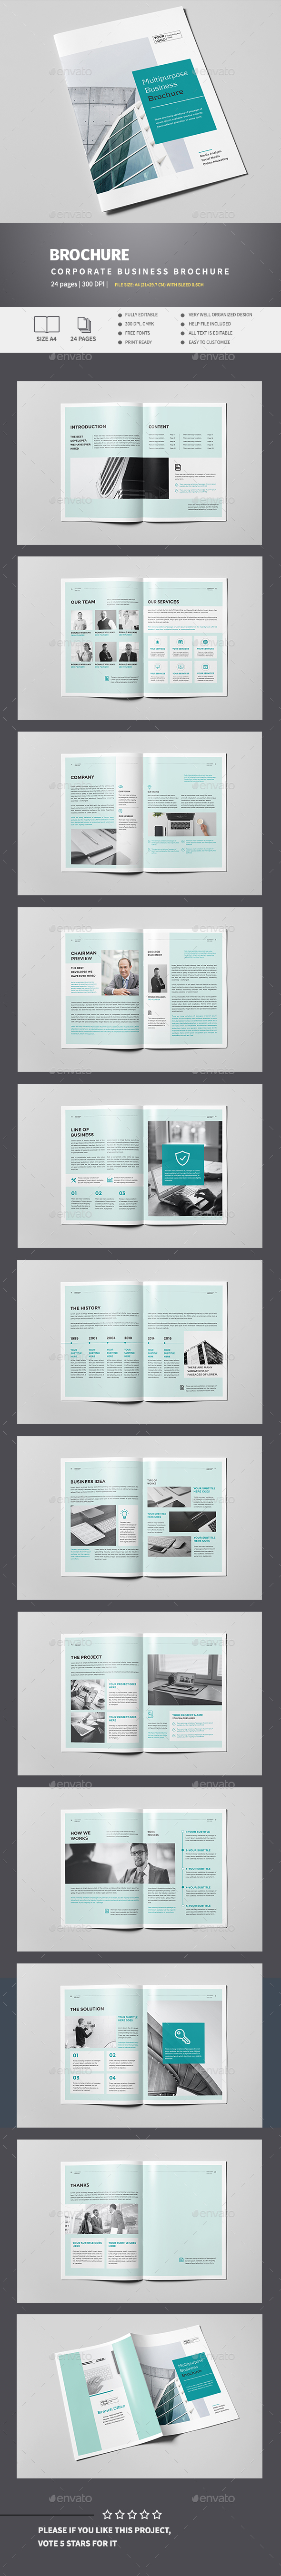 Modern Business Brochure - Corporate Brochures